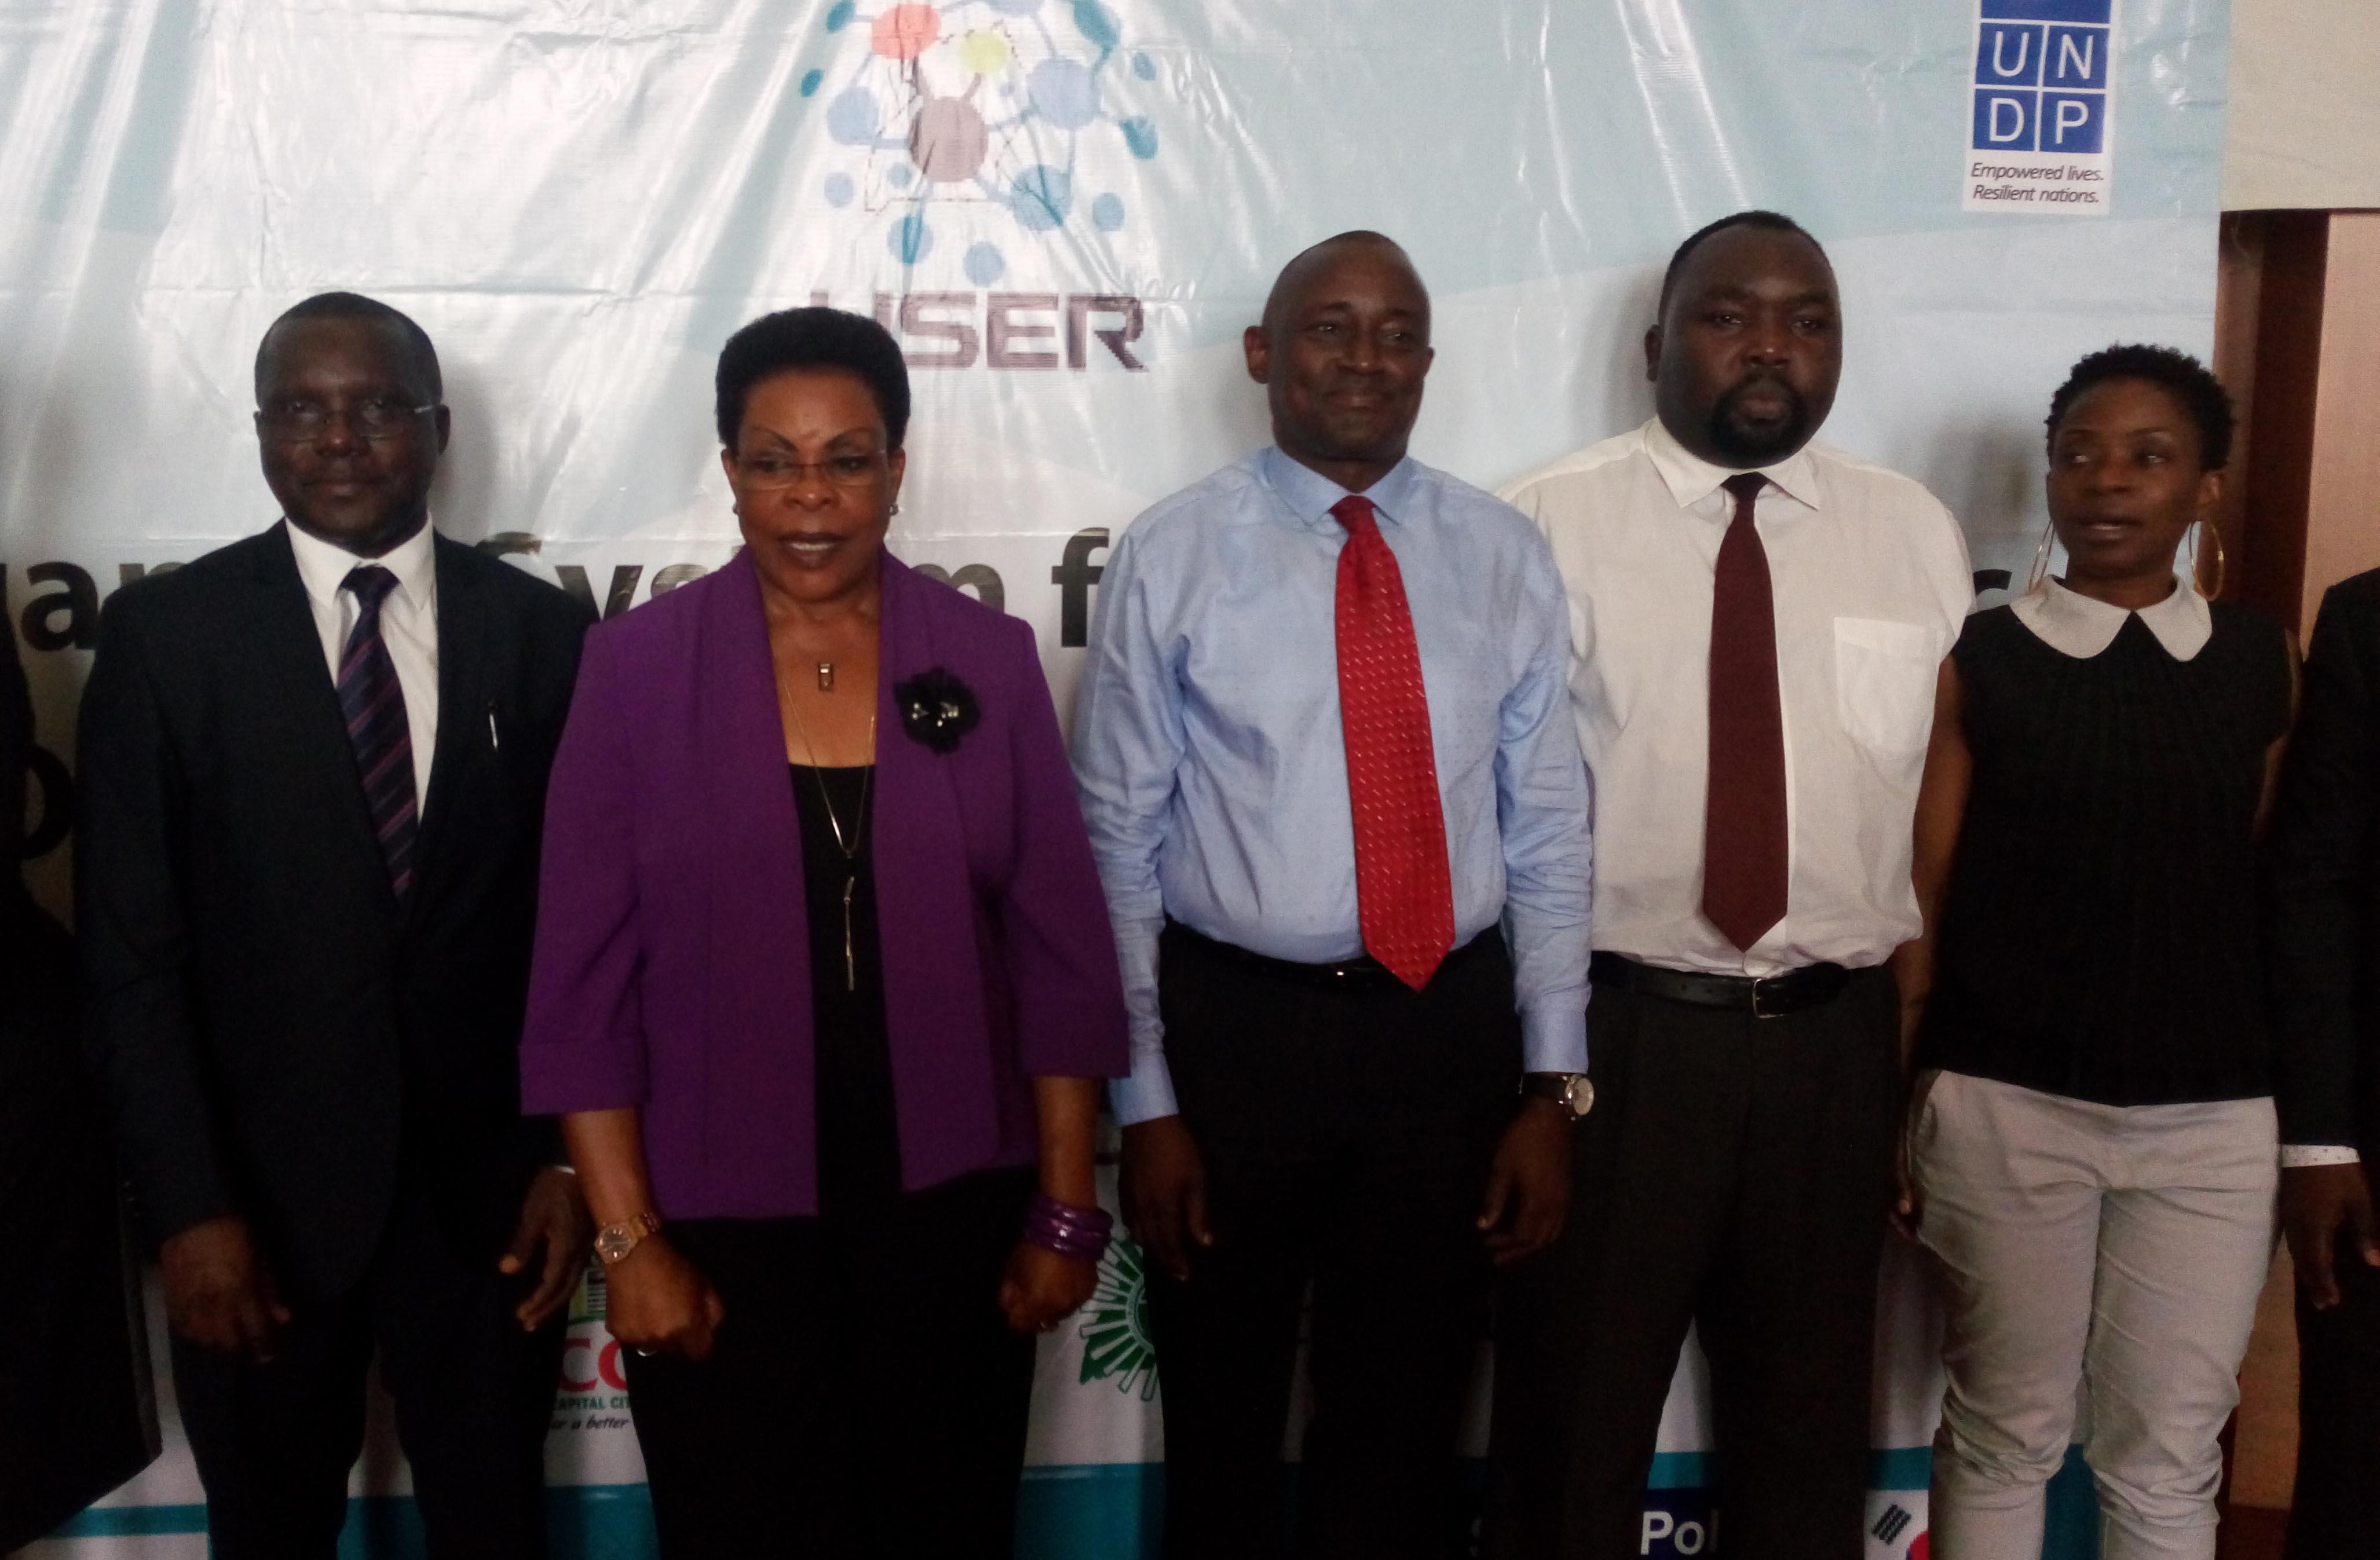 L-R Sam Serunkuuma - deputy Executive Director KCCA, Beti Kamya - Minister for Kampala, Thomas Ole-kuyan - Deputy country director UNDP. Extreme right is Cissy Kagaba Executive Director ACCU